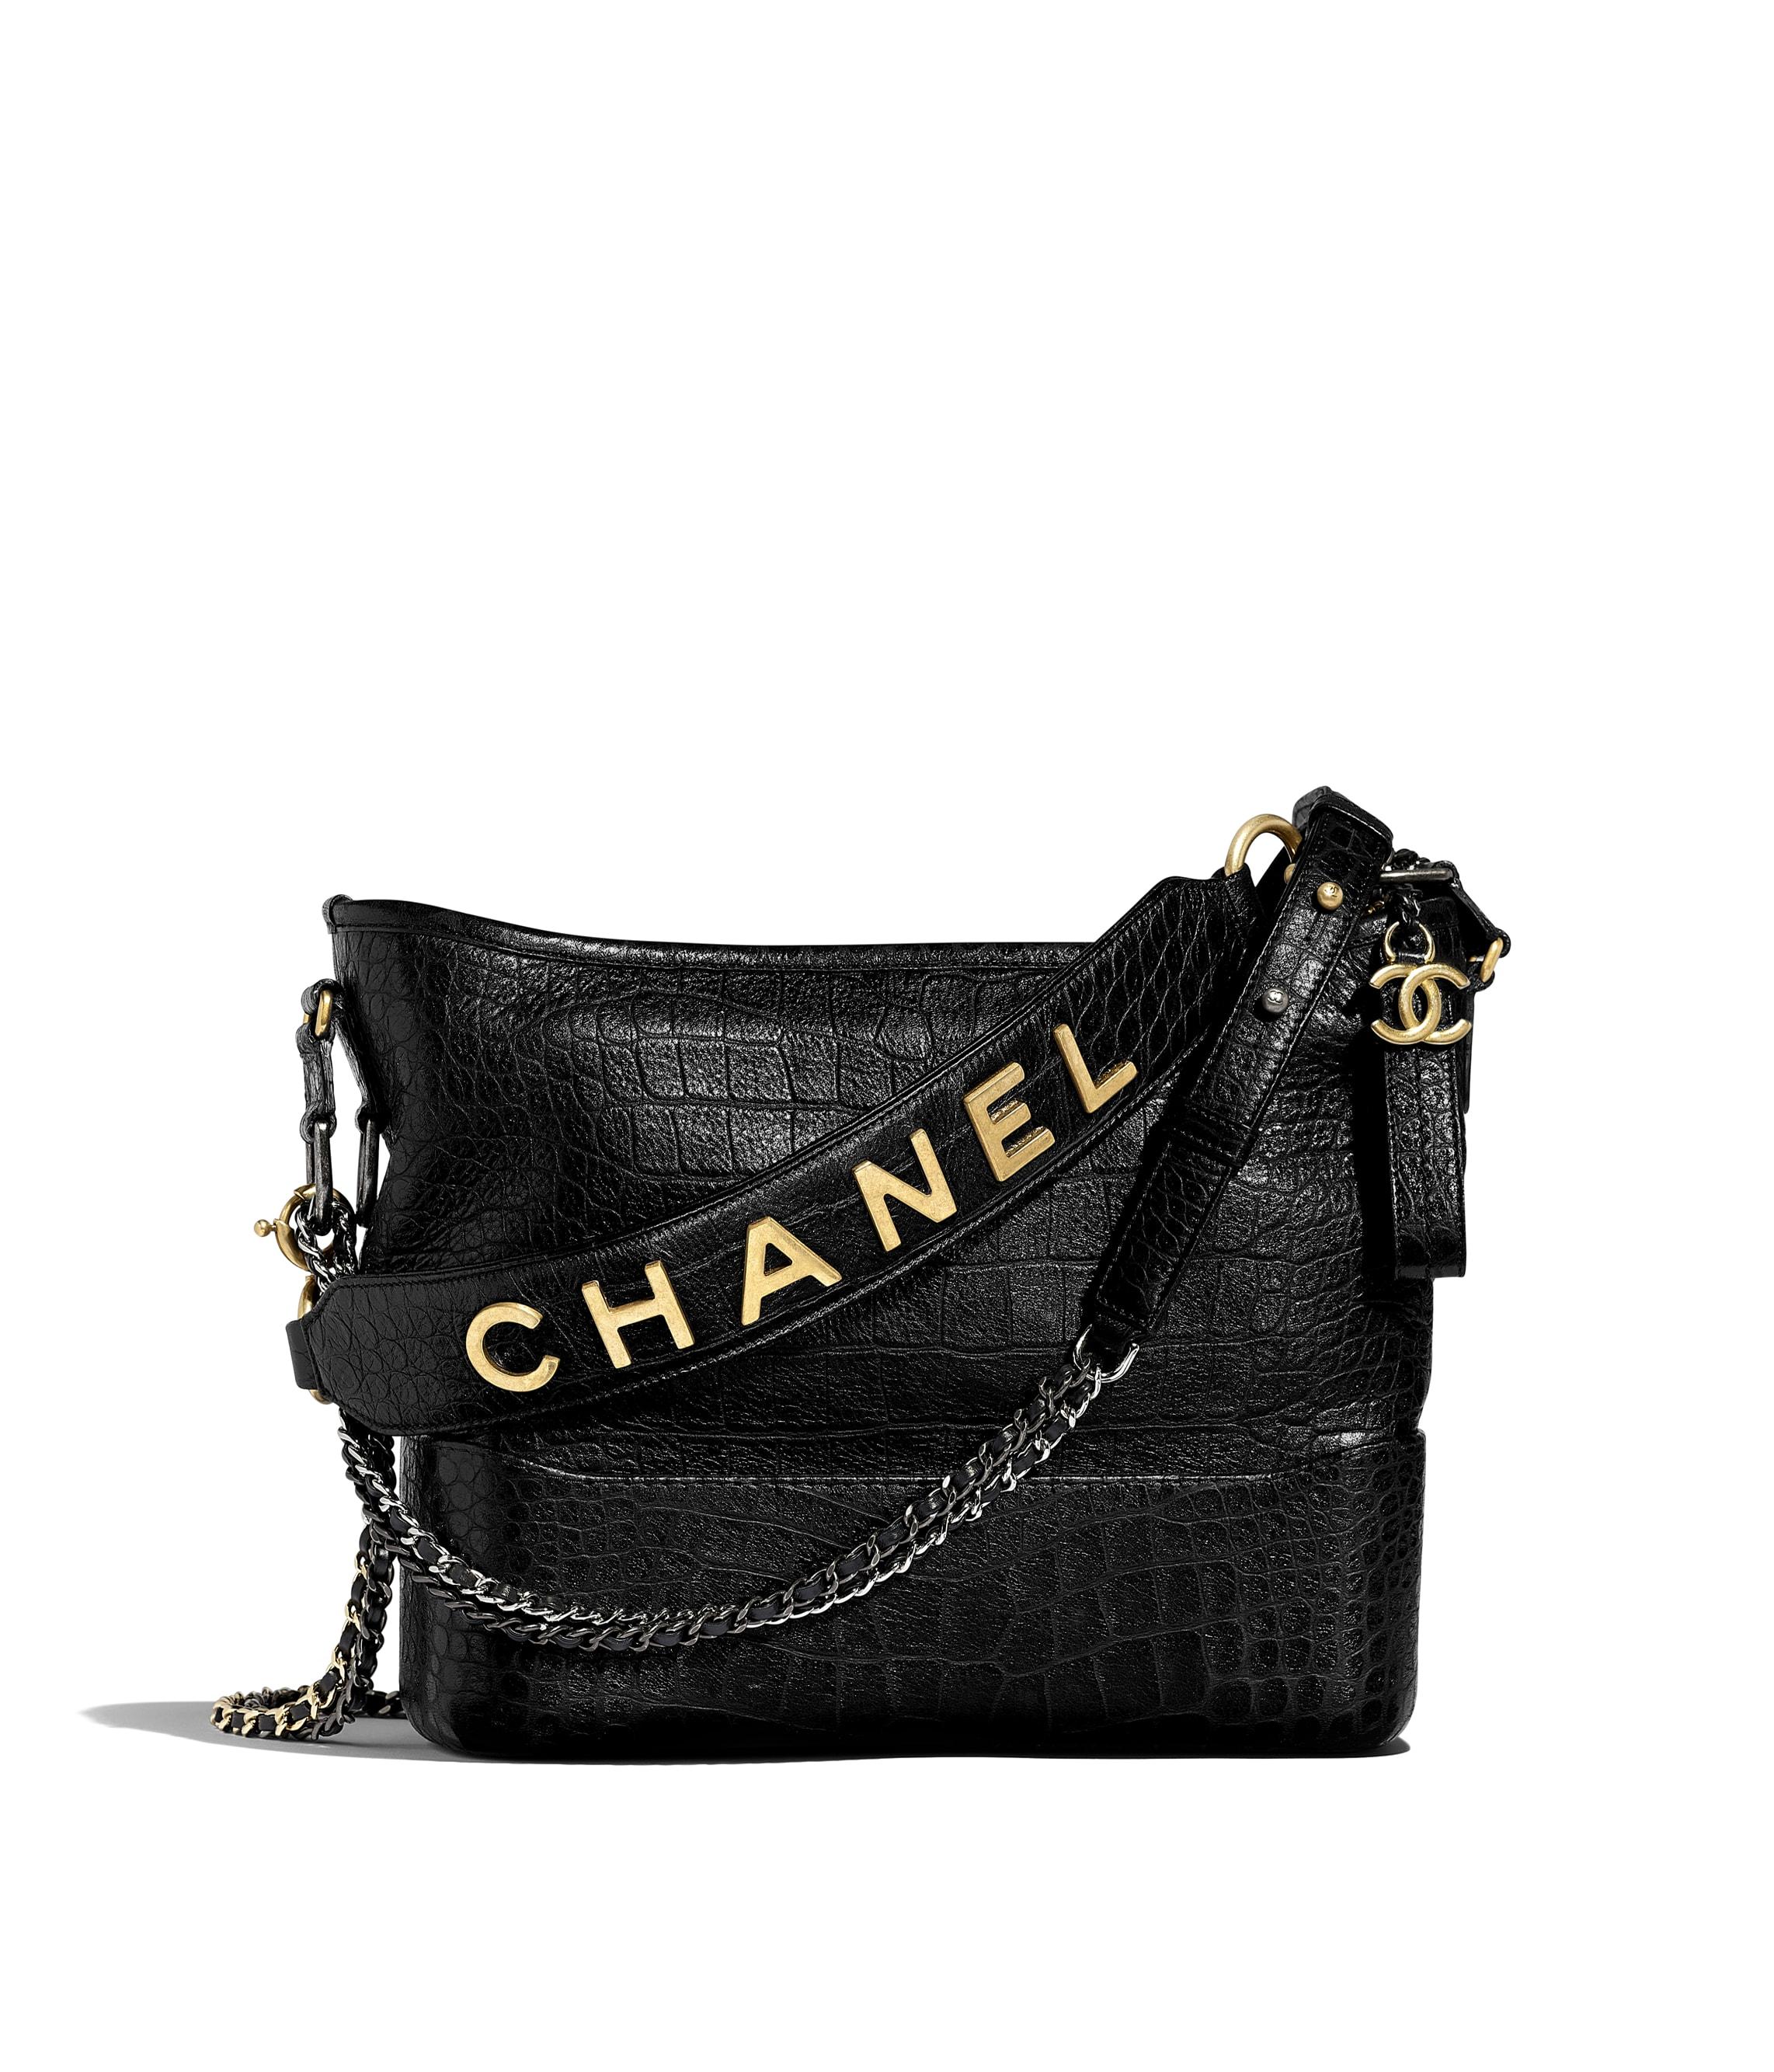 bff6db0e7ef659 CHANEL'S GABRIELLE Hobo Bag, crocodile embossed calfskin, gold-tone ...